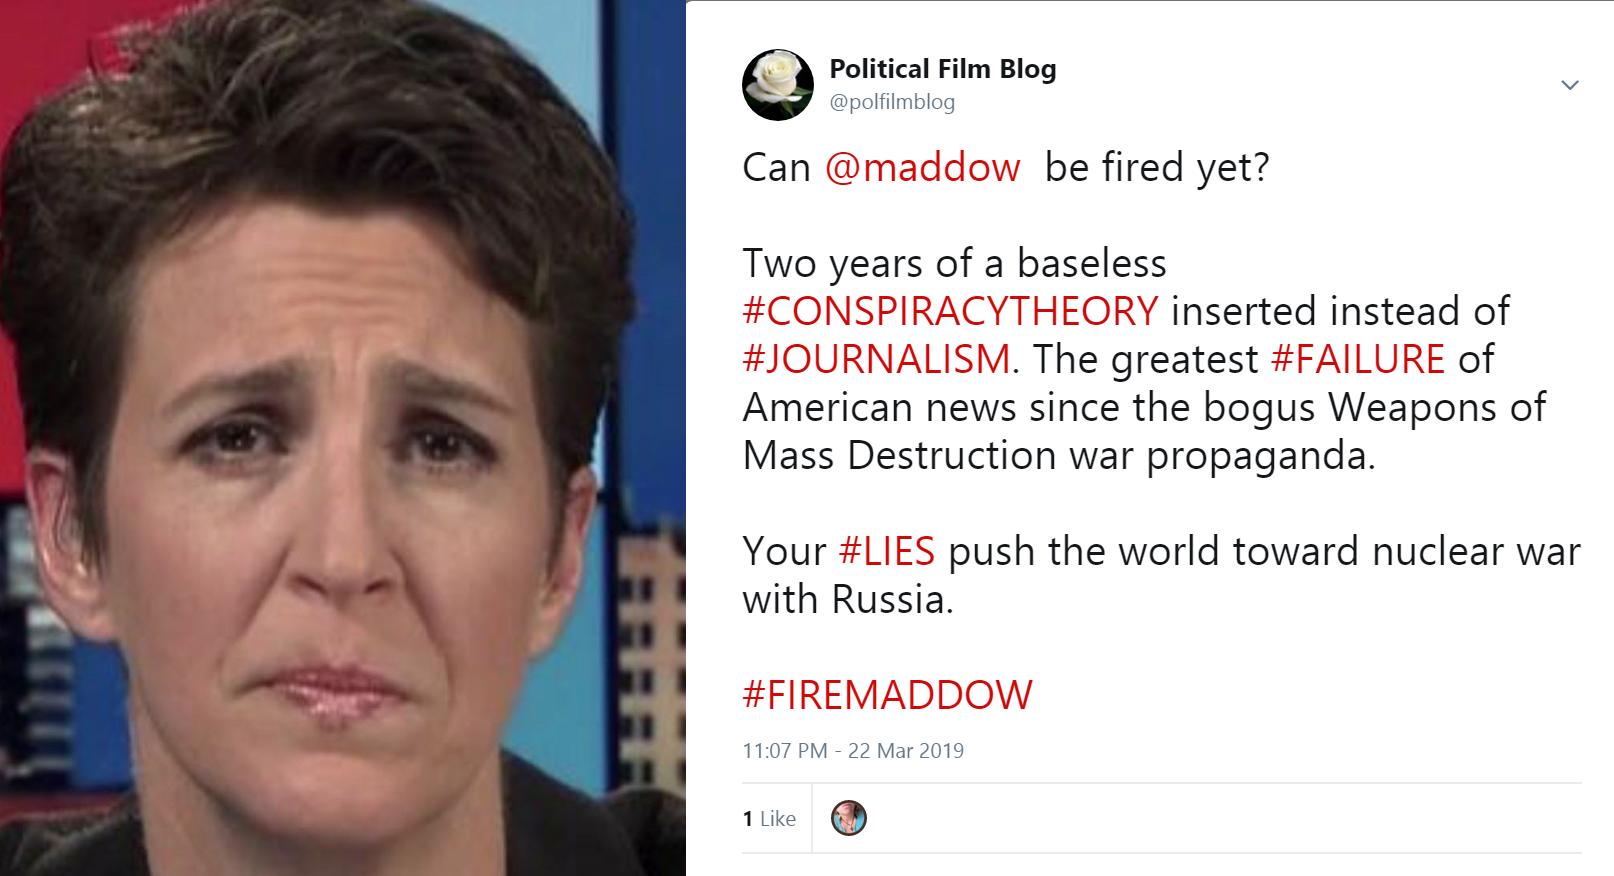 #firemaddow